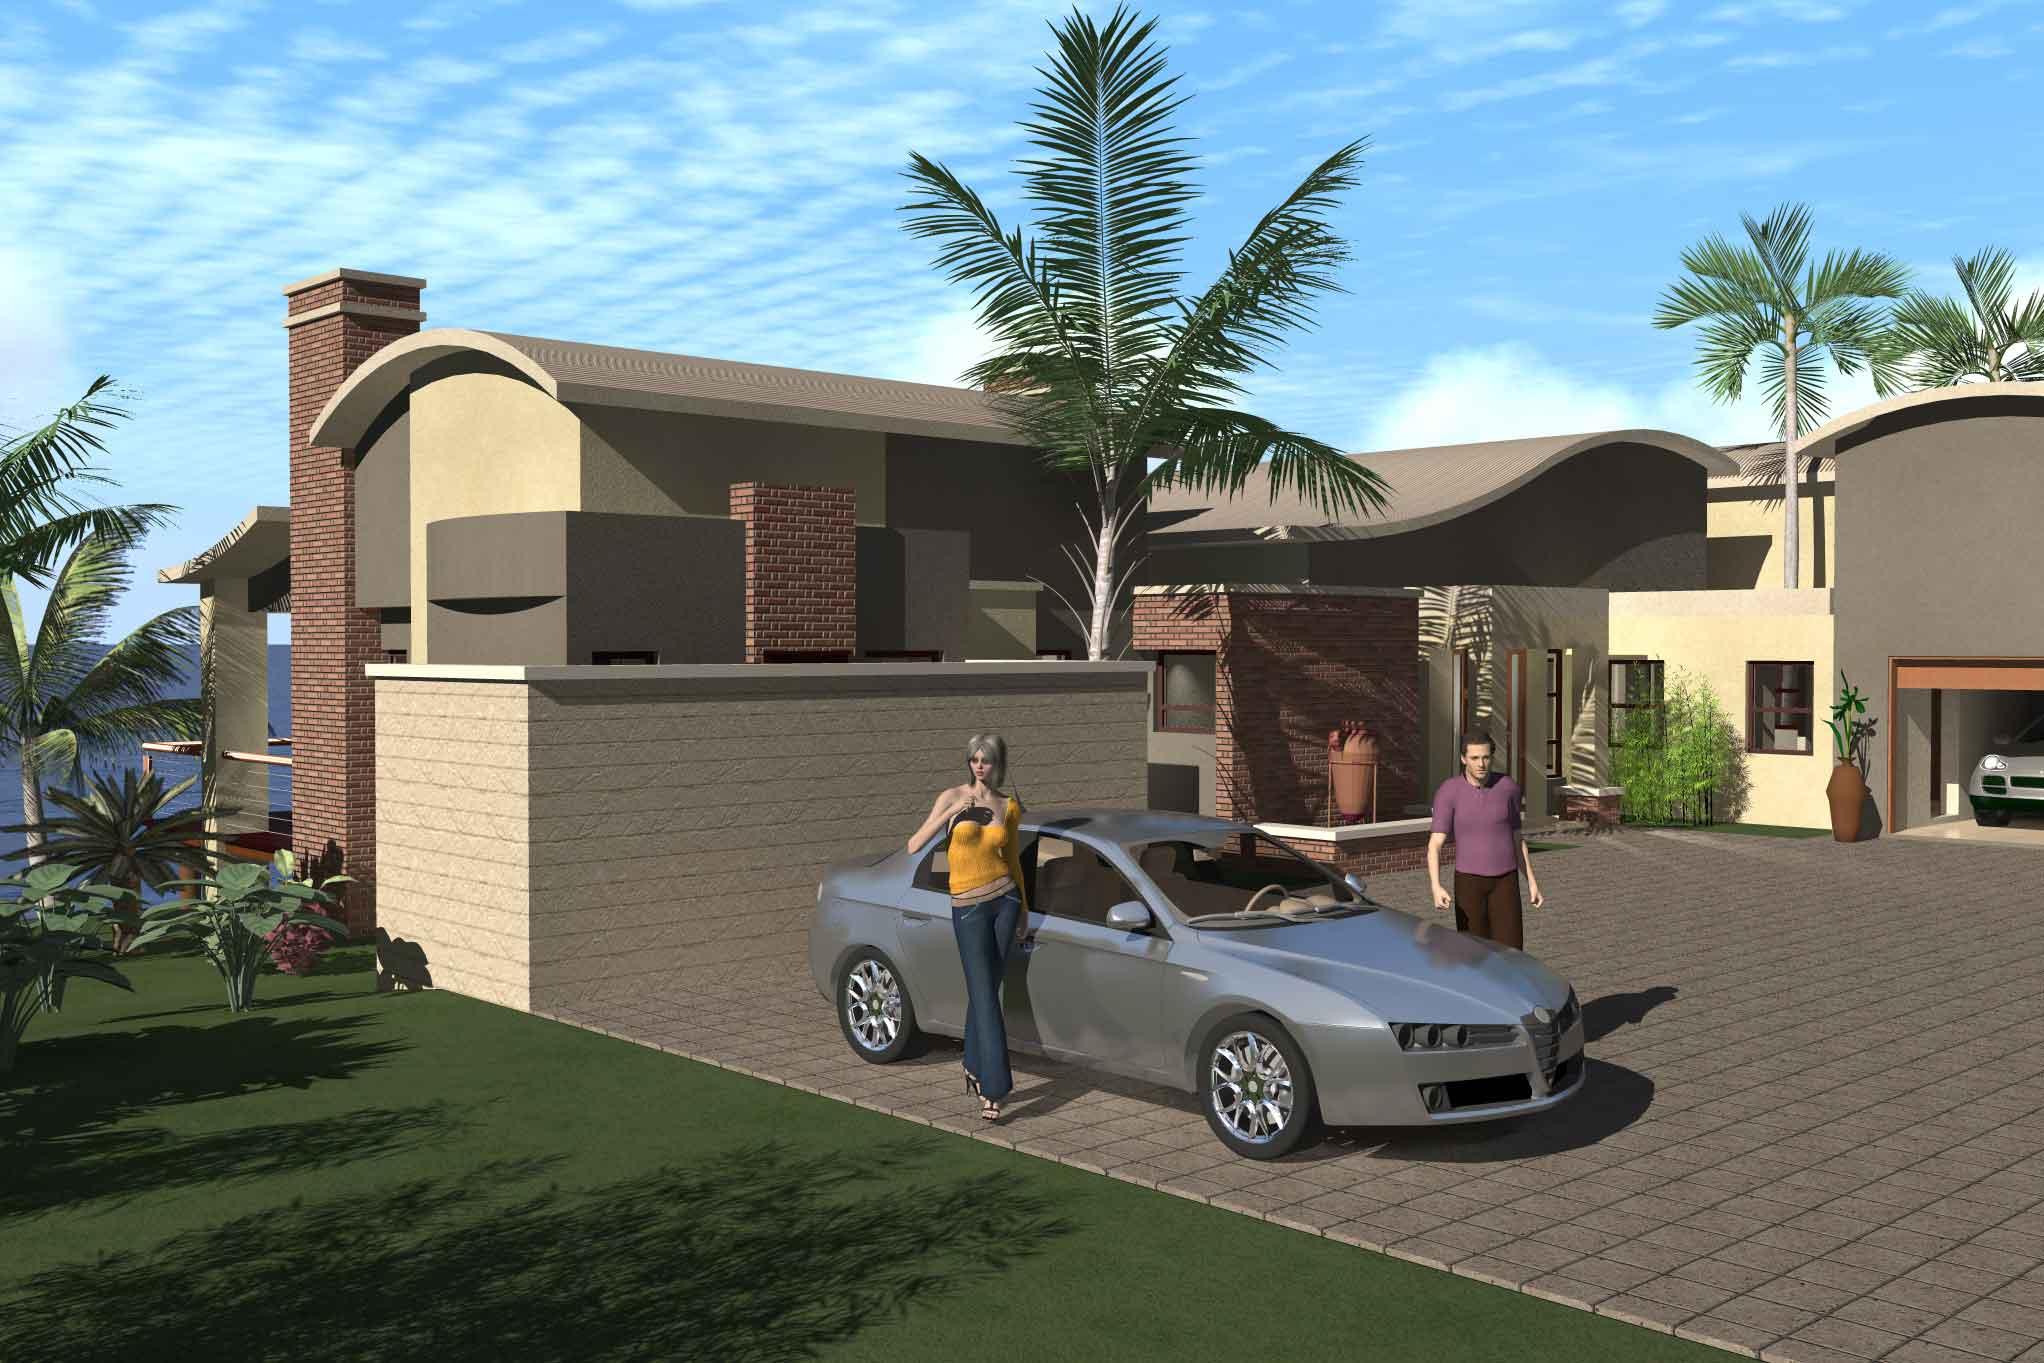 house plans - Architectural Services